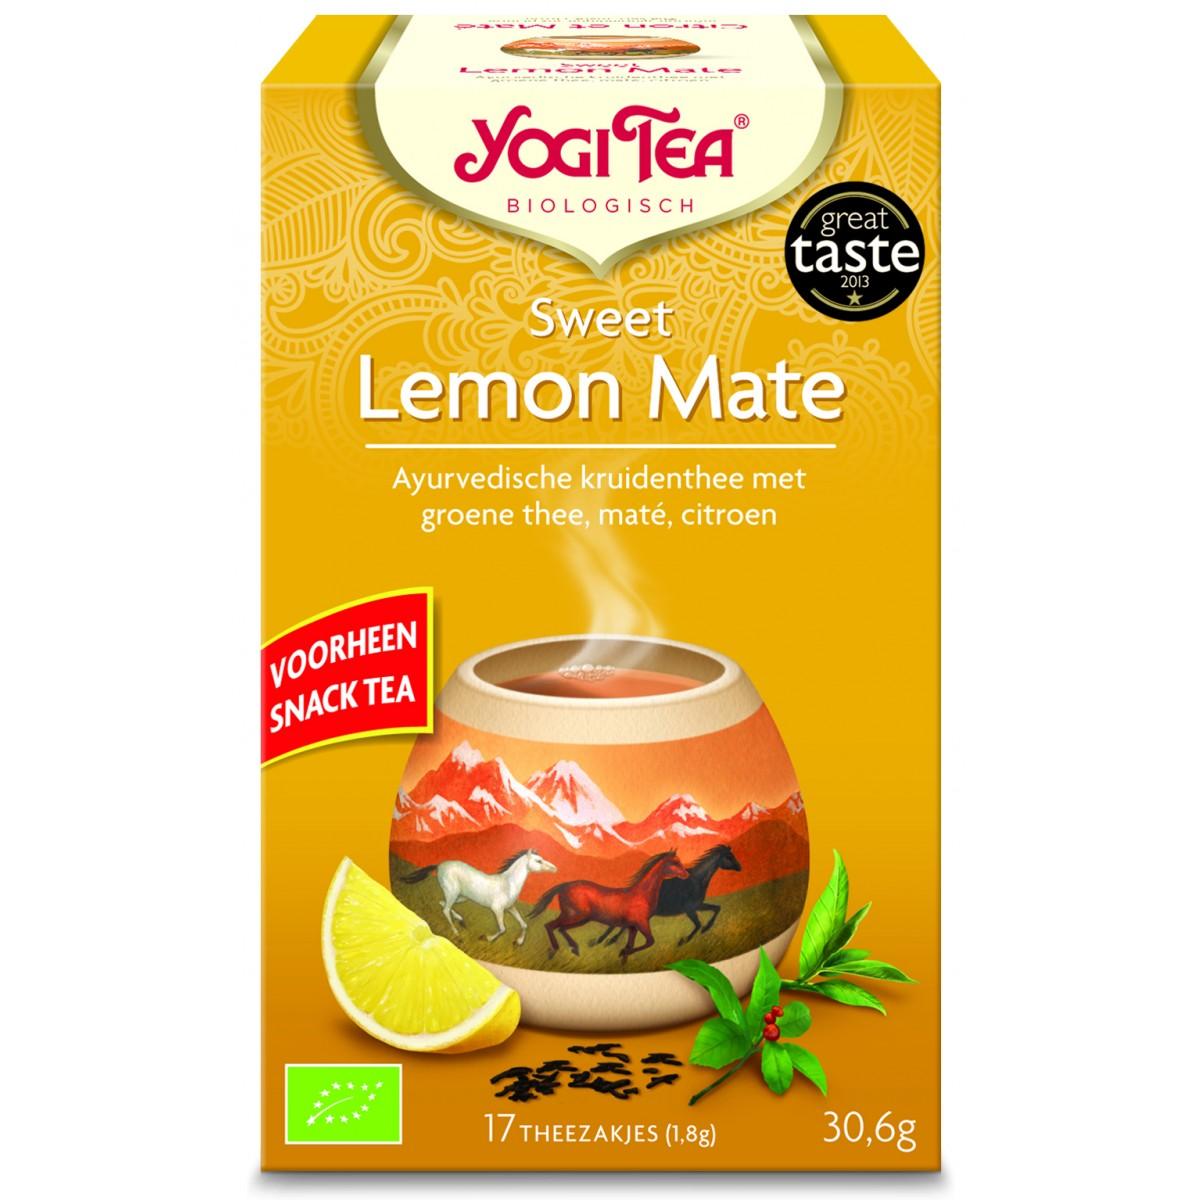 Sweet Lemon Mate